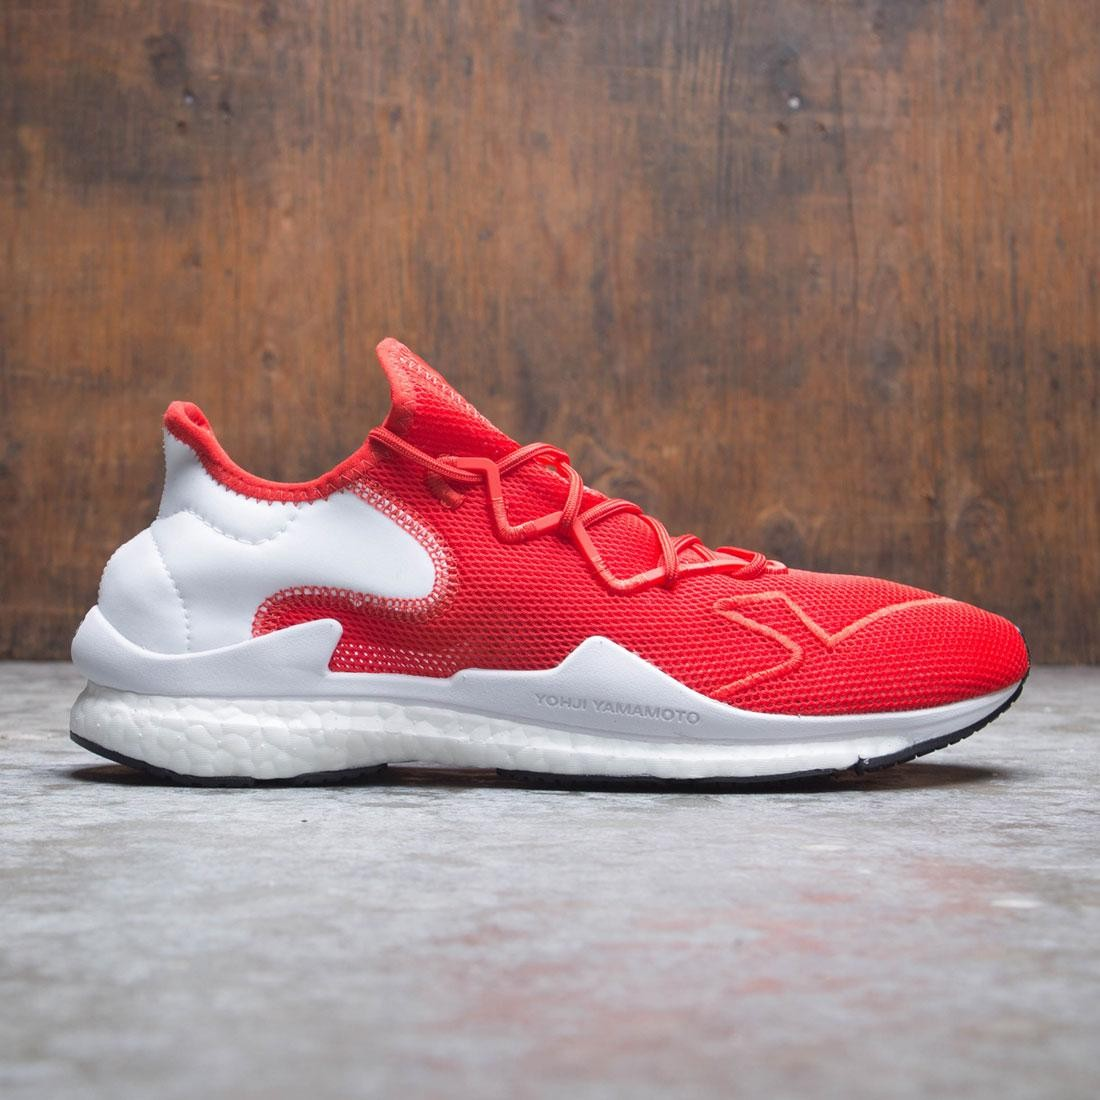 Adidas Y-3 Men Adizero Runner (red / footwear white / core black)